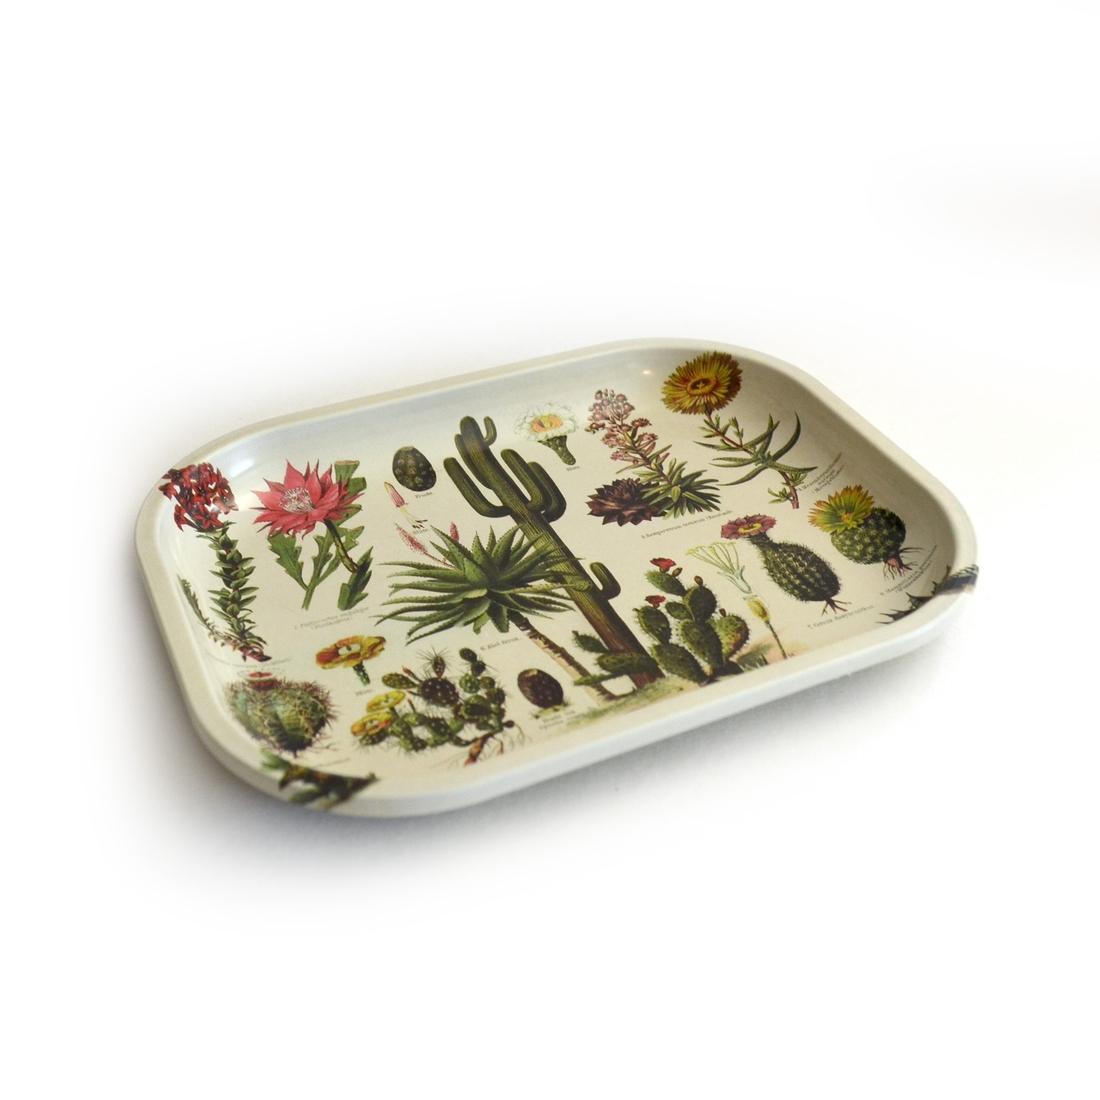 Cacti & Succulents Metal Ritual Tray, alternate view